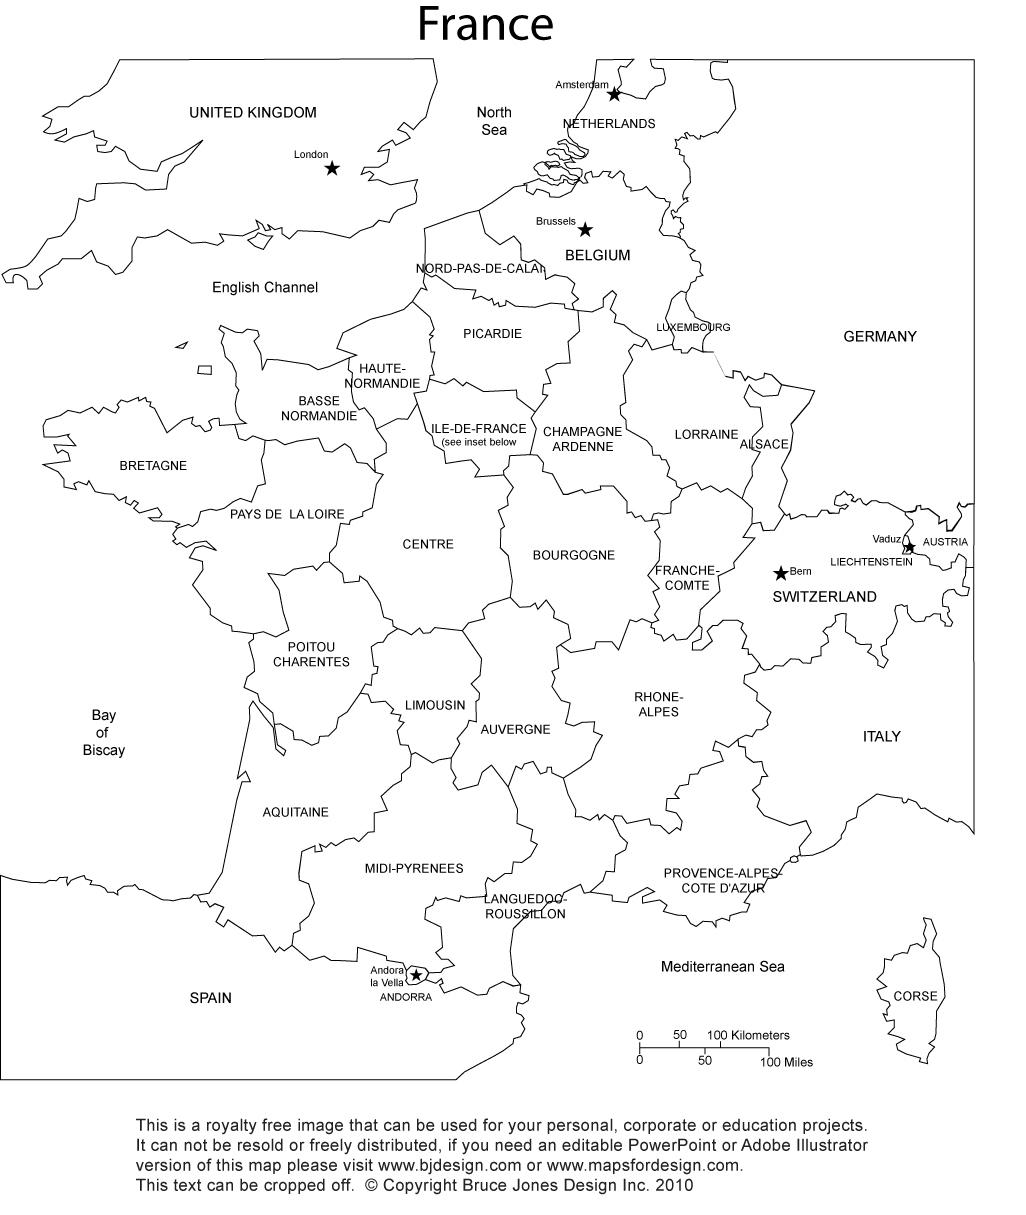 France Map Printable Blank Royalty Free